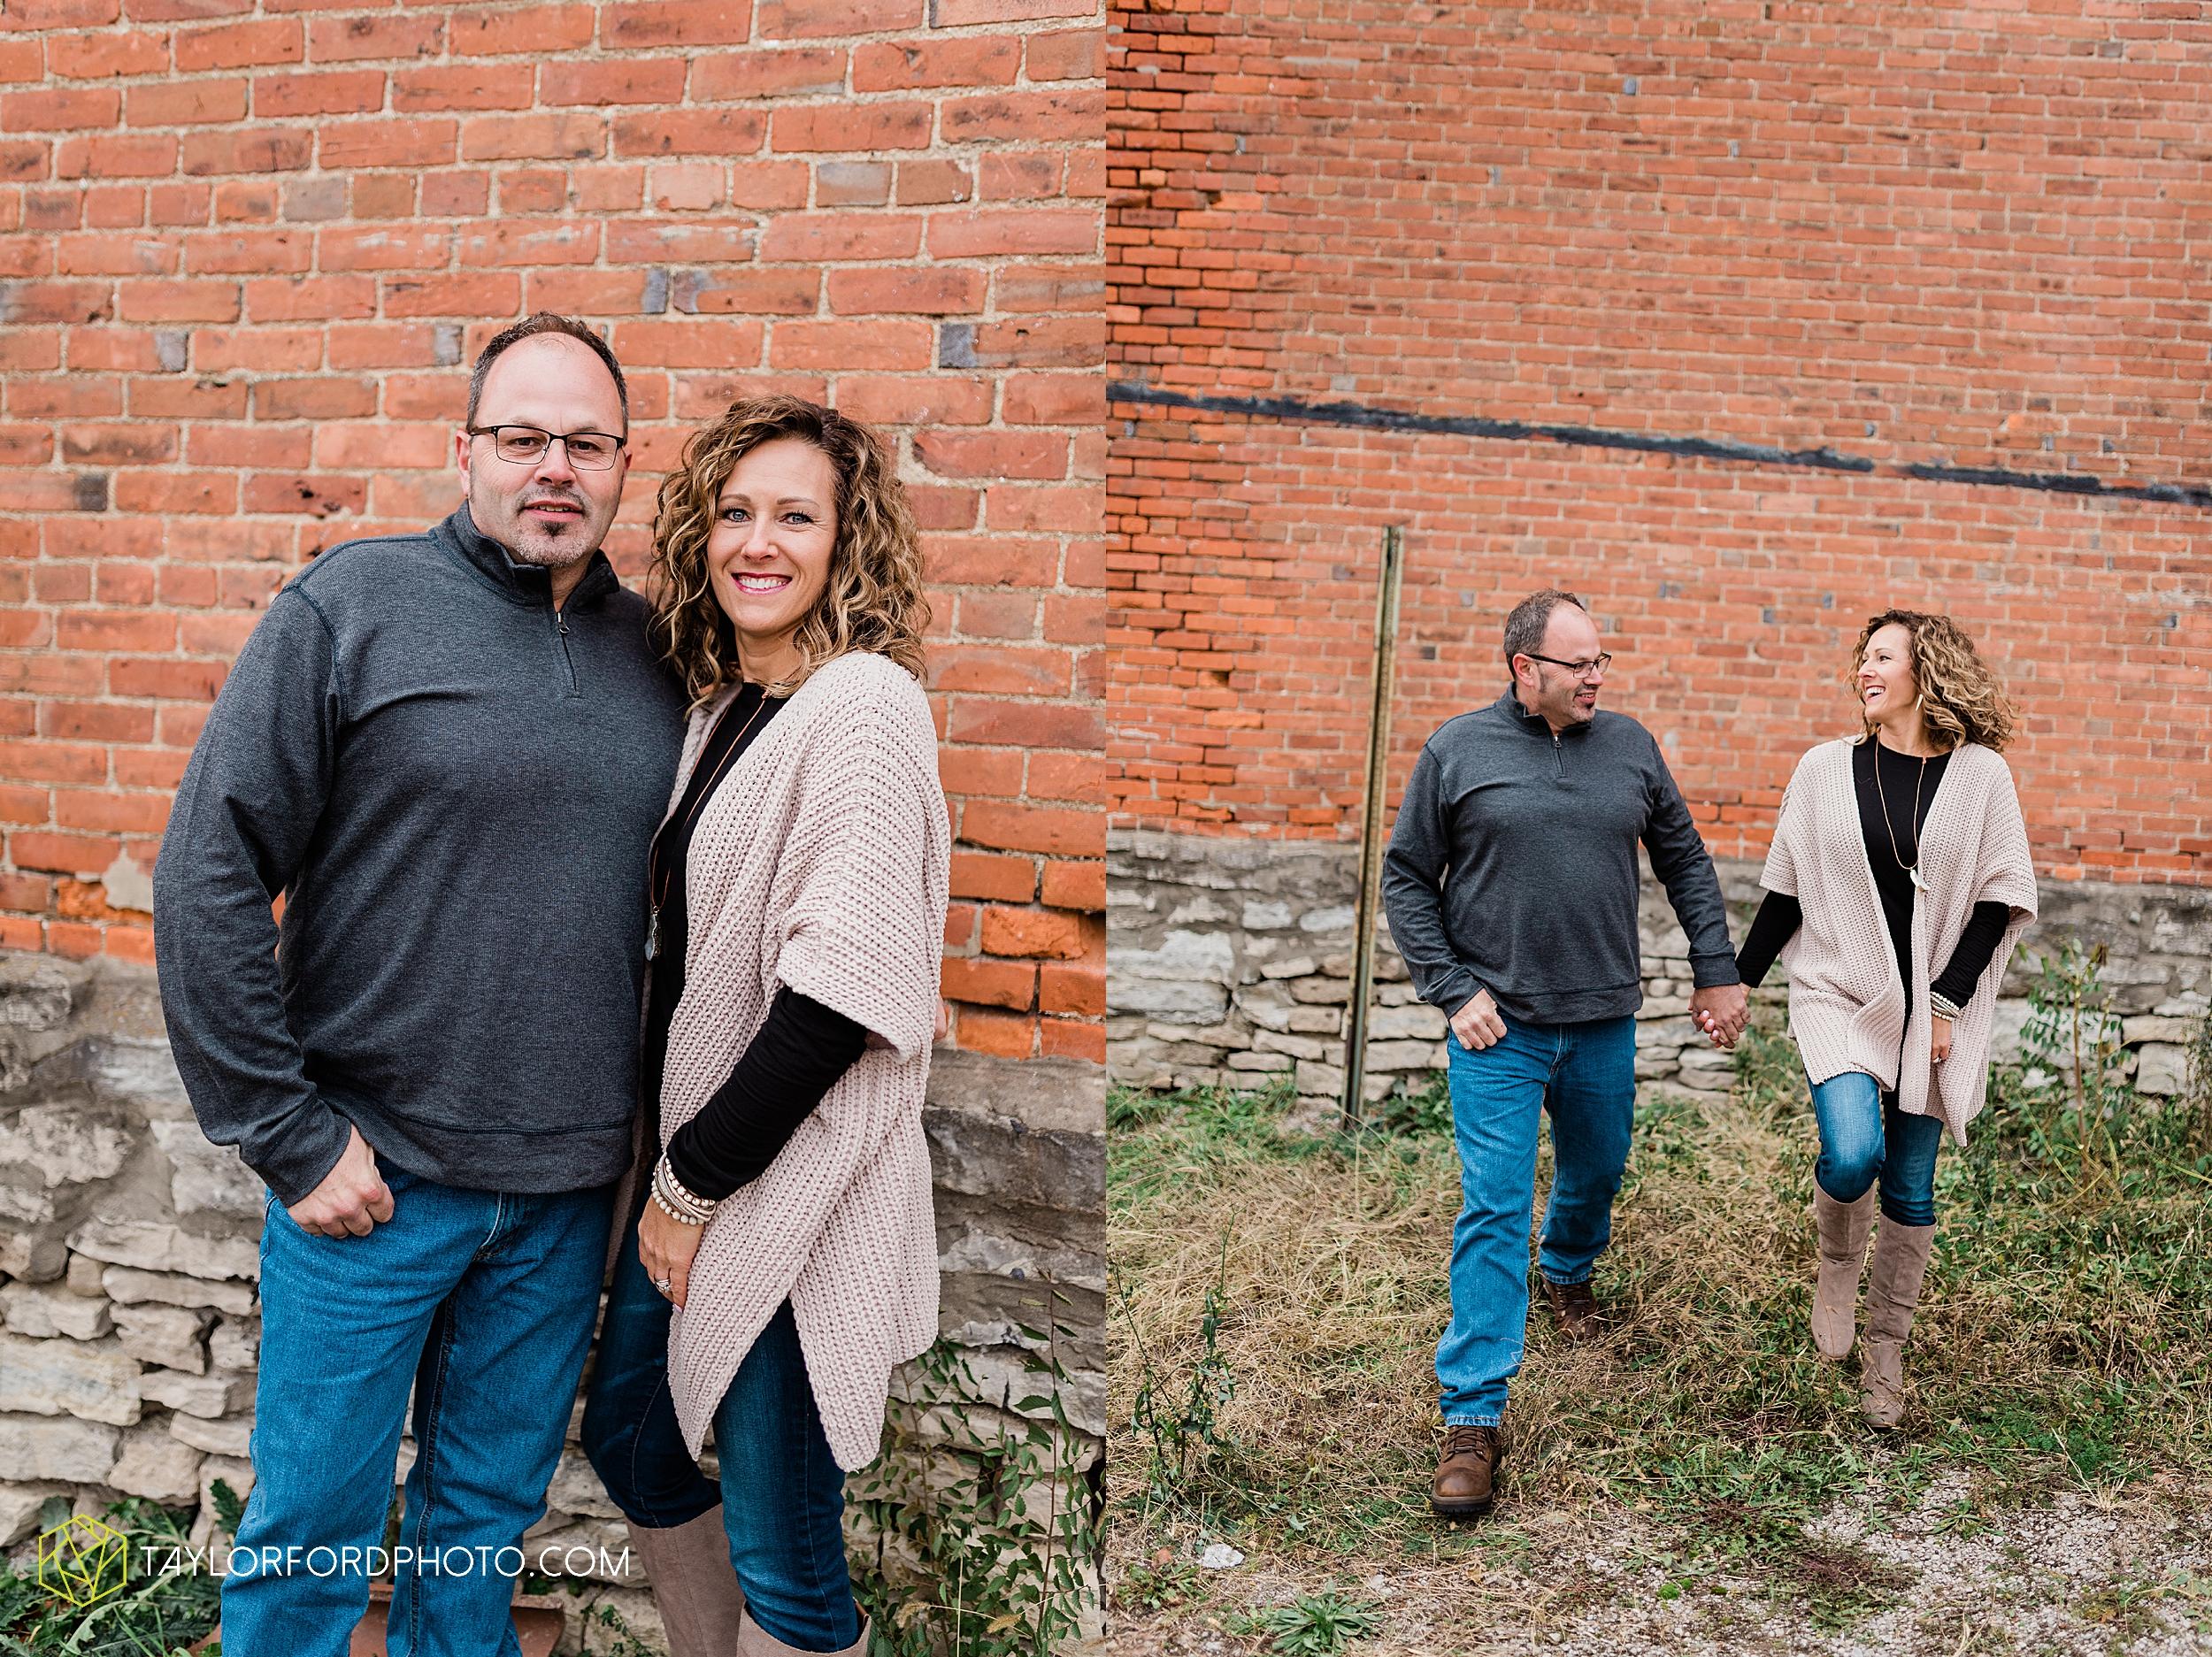 downtown-van-wert-ohio-fall-family-photographer-taylor-ford-hirschy-photographer_1651.jpg